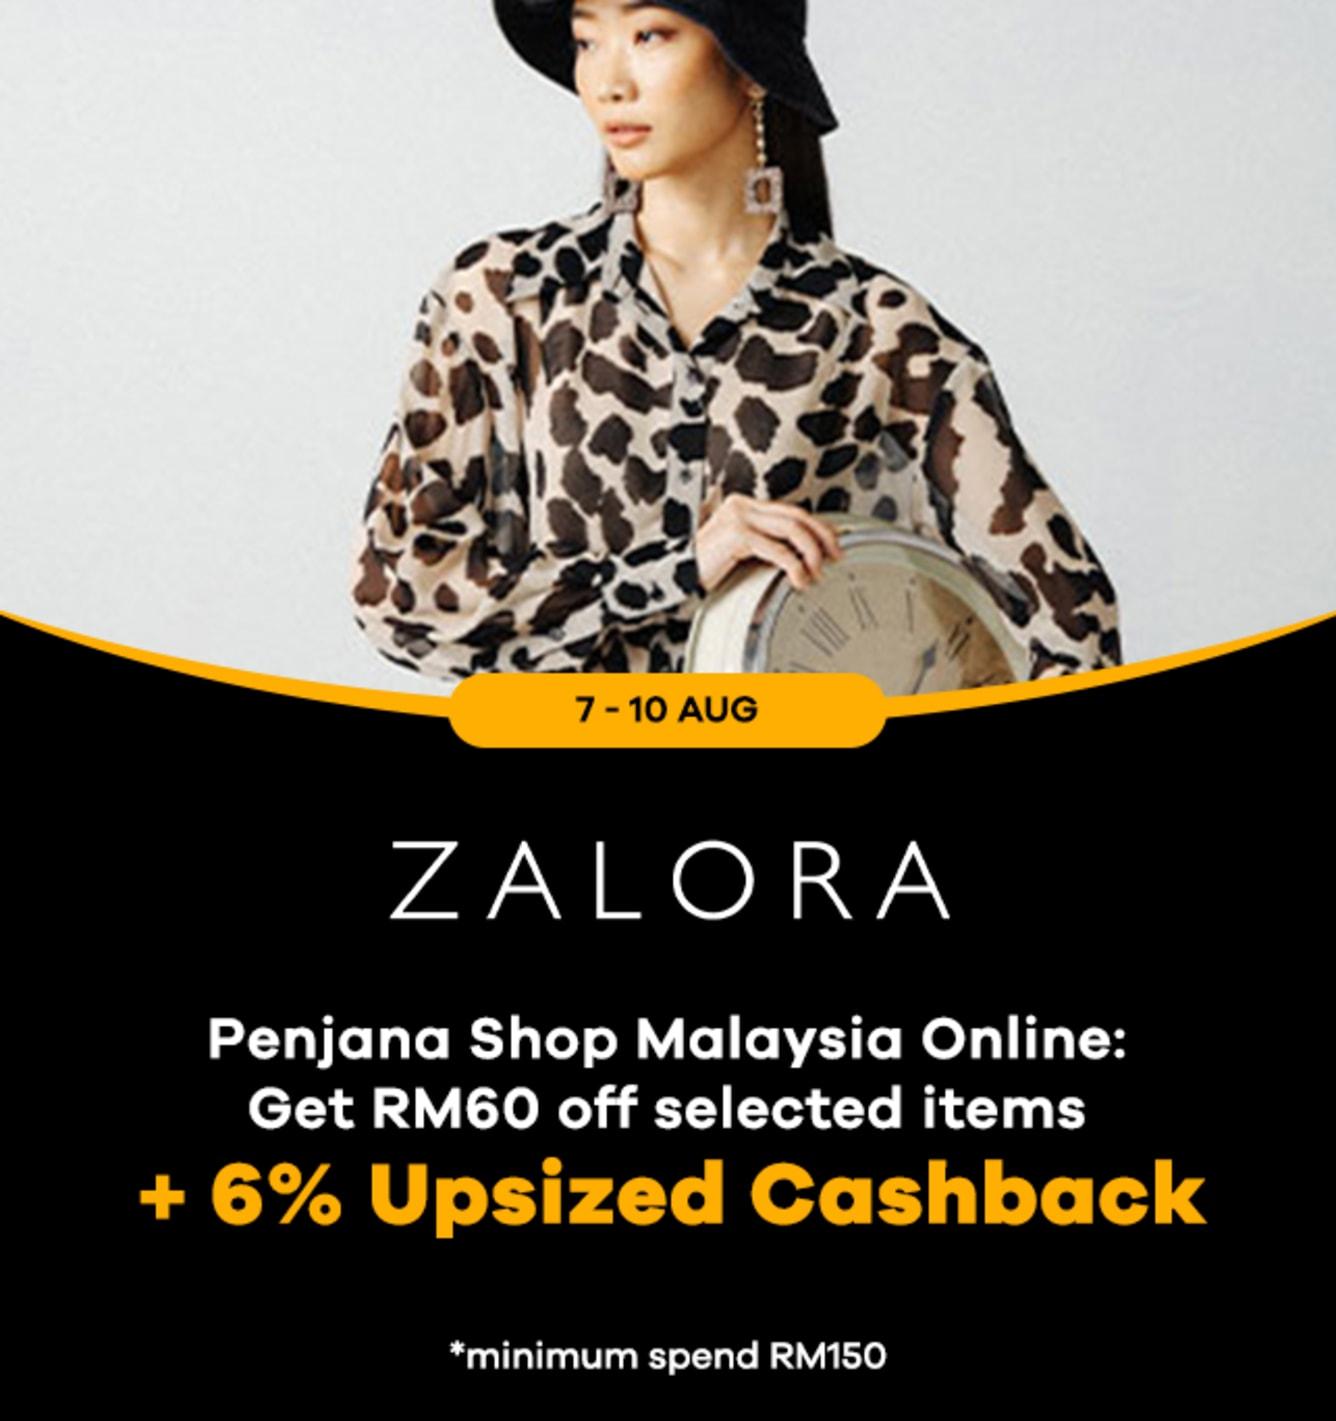 Zalora 12% Upsized Cashback Shopback